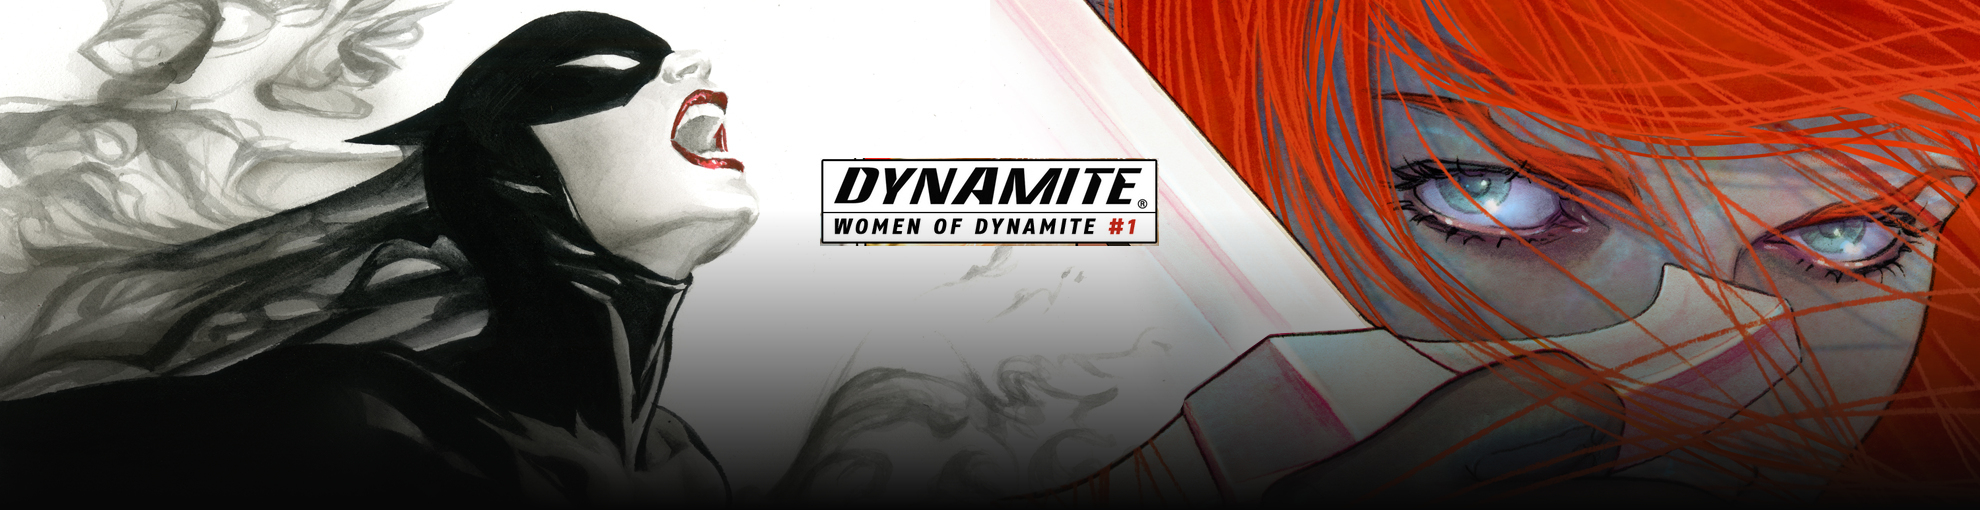 GroupeesDynamiteWomenBundle-MockUp-A.jpg